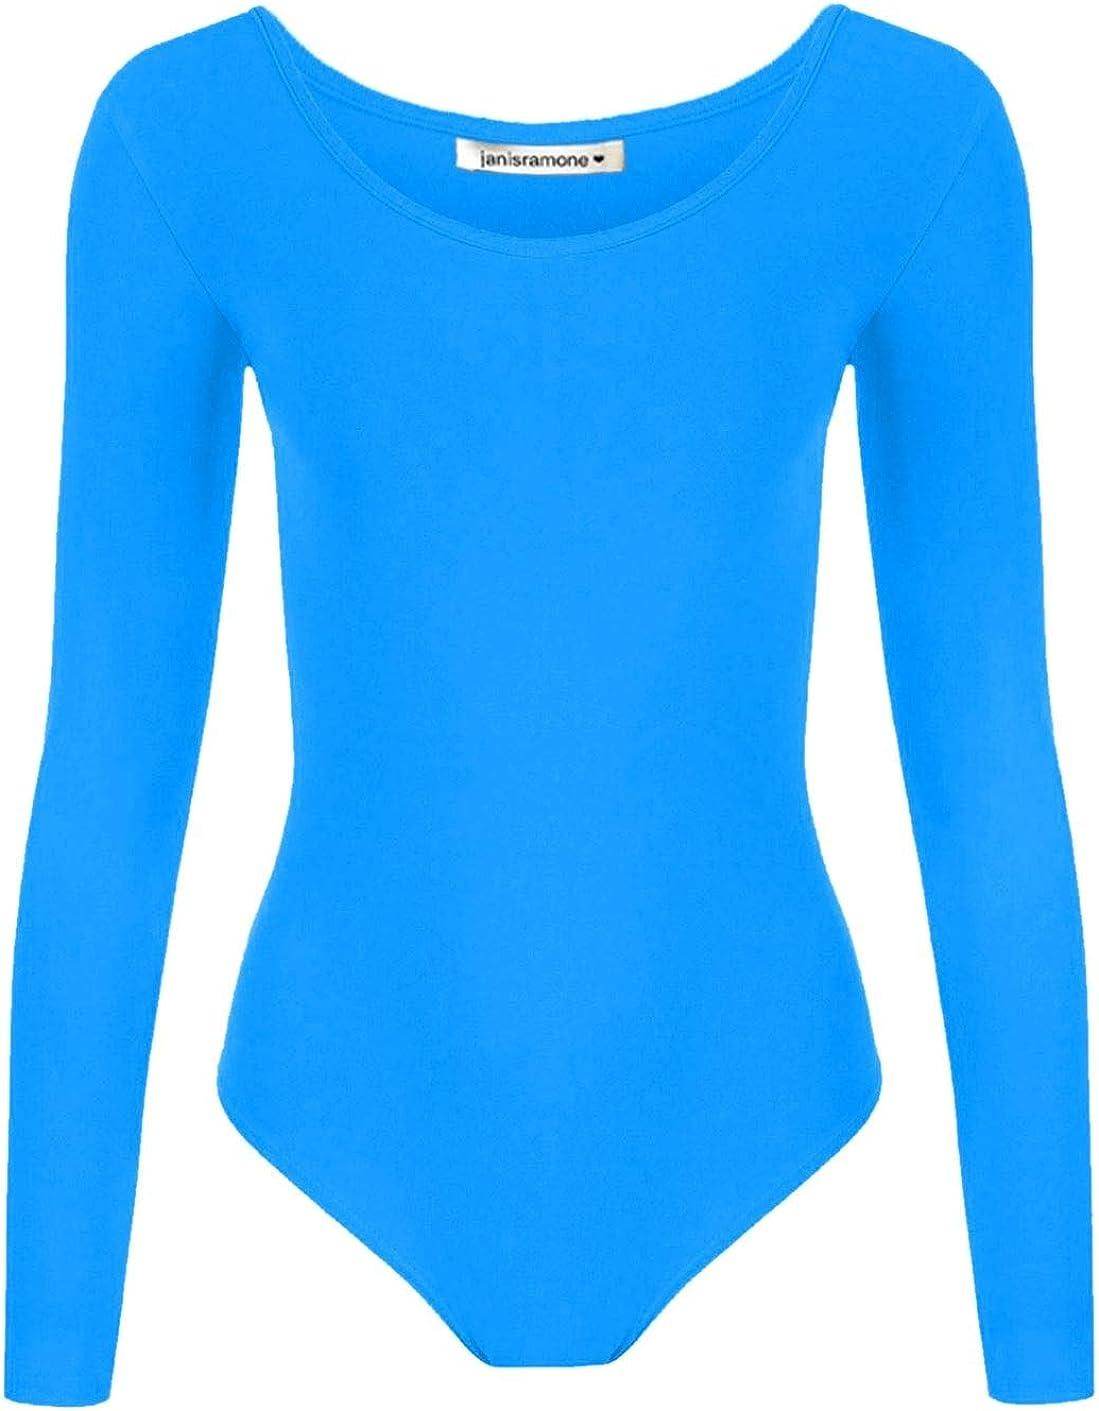 janisramone Girls Kids New Plain Long Sleeve Round Neck Microfibre Stretch Dance Gymnastics Leotard Bodysuit Top